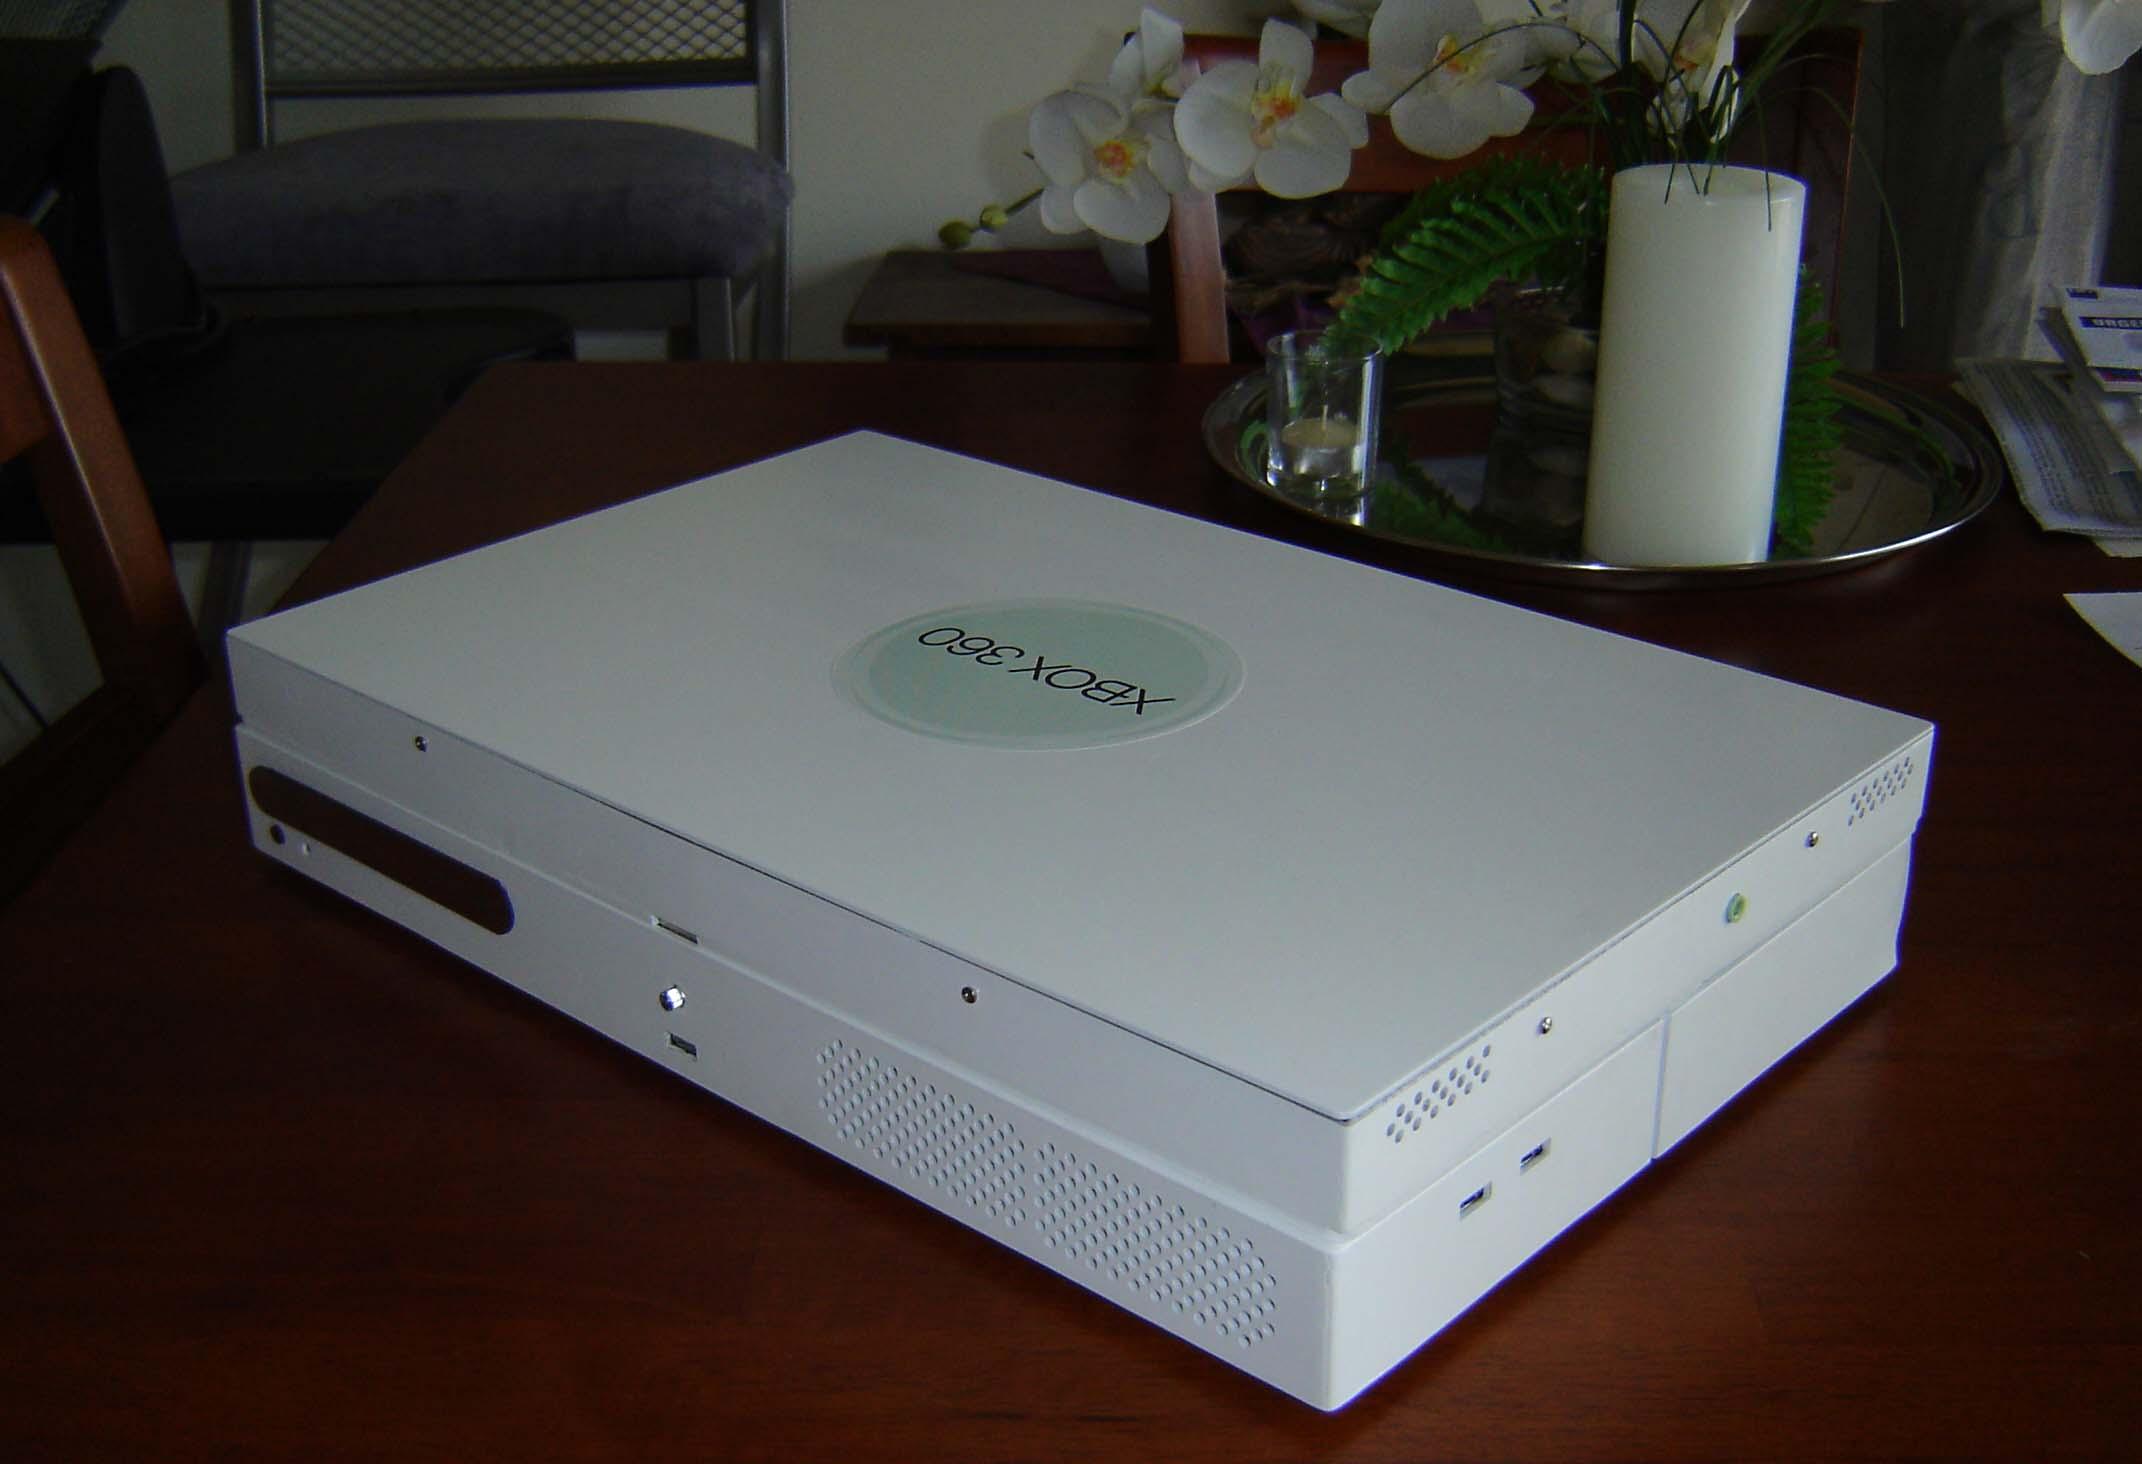 Xbox Laptop 360 Xbox 360 Laptop (Origi...